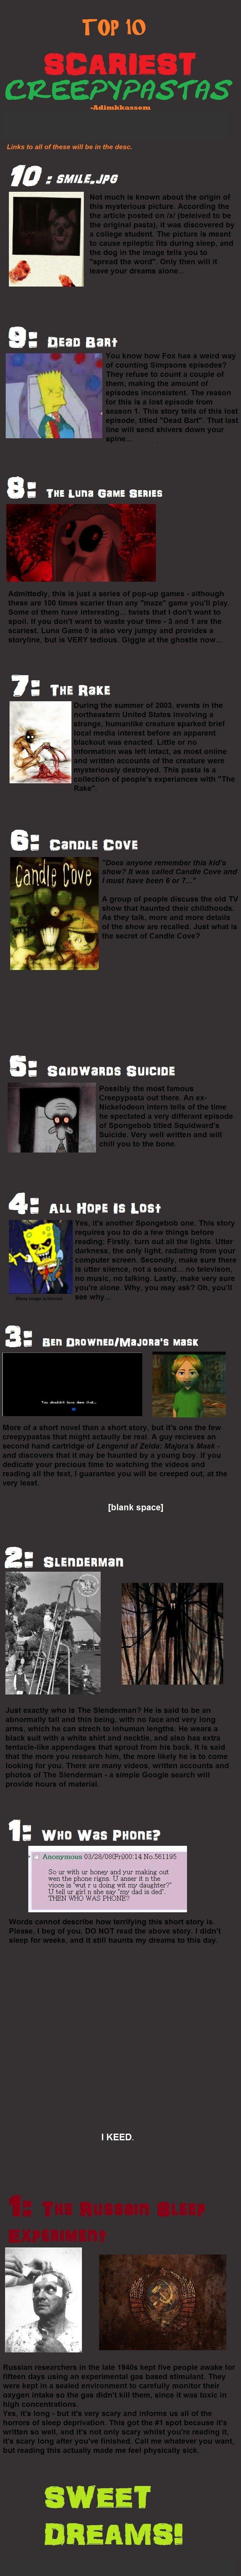 Top 10 Creepypastas. Smile.jpg: knowyourmeme.com/memes/smilejpg#.Tquaed4r2so Dead Bart: creepypasta.wikia.com/wiki/DeadBart The Luna Game Series: knowyourmeme.c Top 10 Creepypastas Smile jpg: knowyourmeme com/memes/smilejpg# Tquaed4r2so Dead Bart: creepypasta wikia com/wiki/DeadBart The Luna Game Series: c